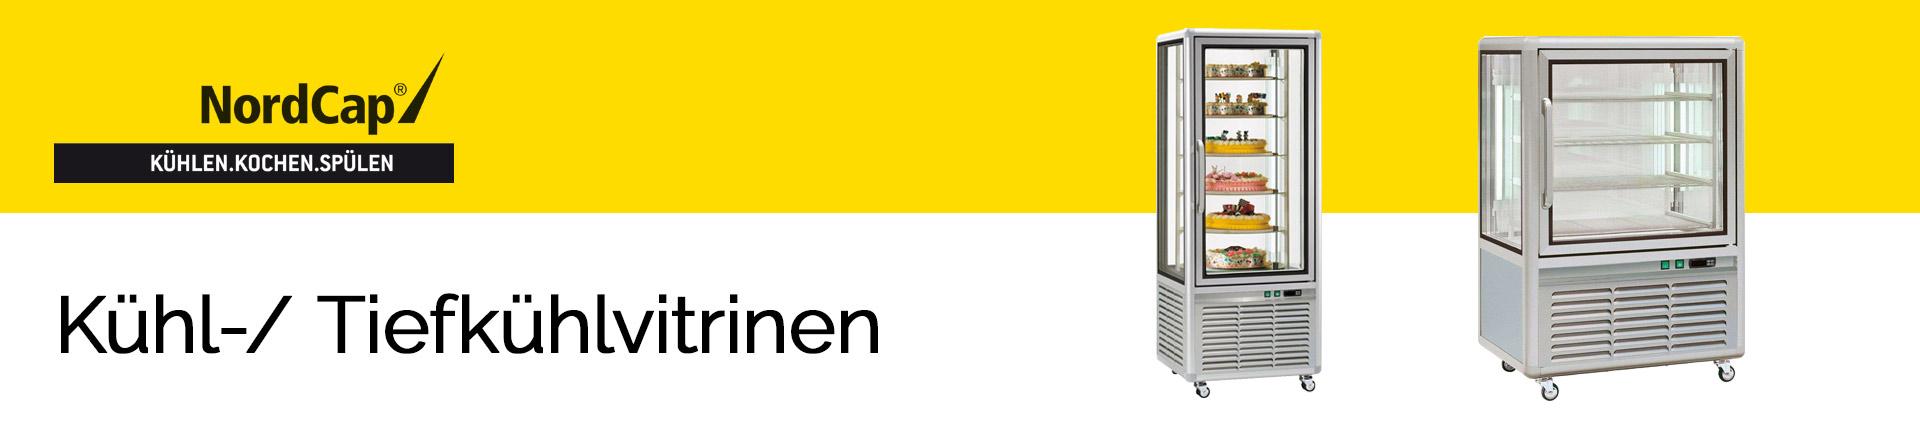 NordCap Kühl-/ Tiefkühlvitrinen Banner